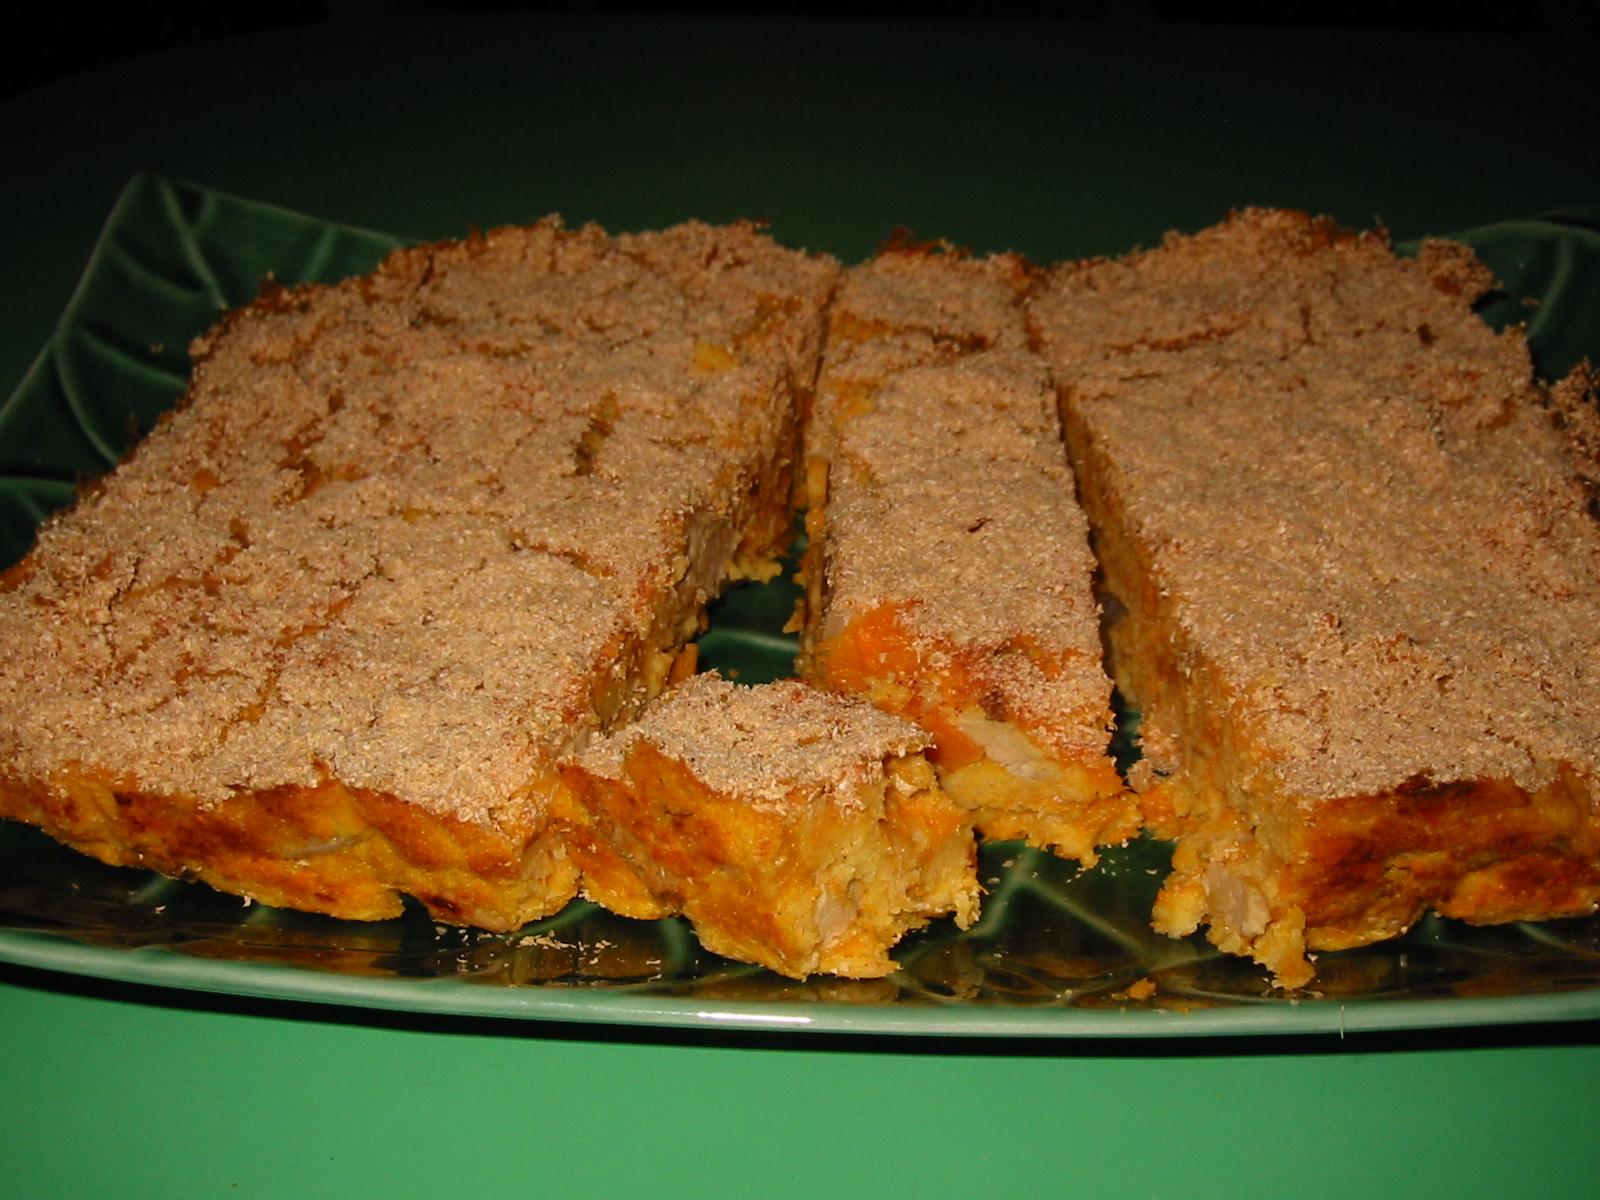 Meatless Mondays: Sweet Potato and Pumpkin Polenta Bake